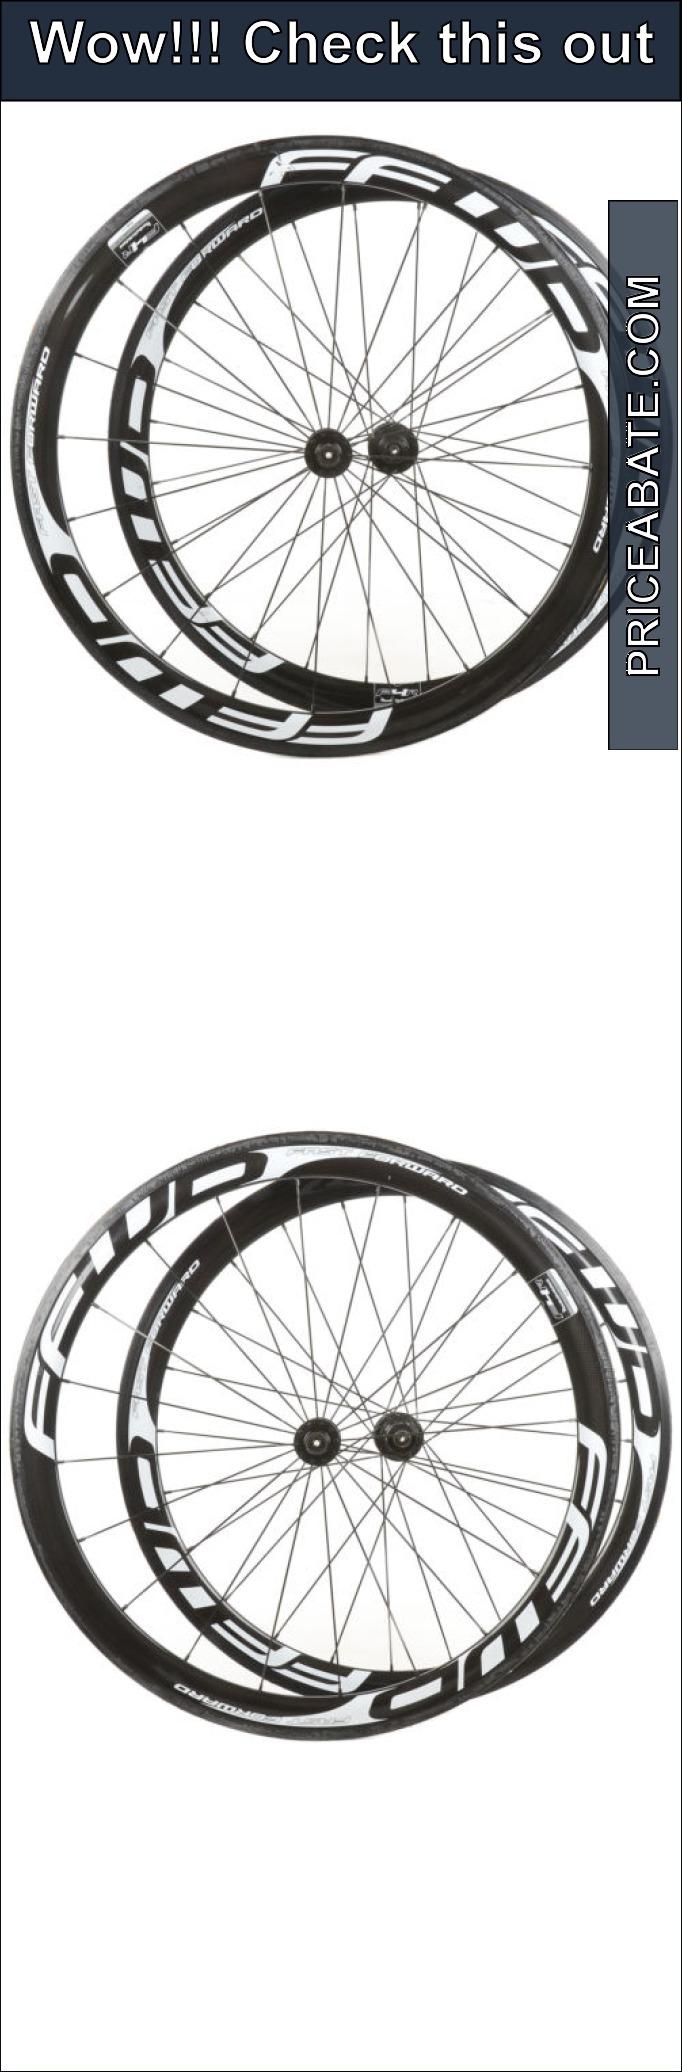 bicycle-parts: Fast Forward F4R Carbon Road Bike Wheel Set 700c Tubular Shimano Sram 11 Speed #Bicycle - Fast Forward F4R Carbon Road Bike Wheel Set 700c Tubular Shimano Sram 11 Speed...